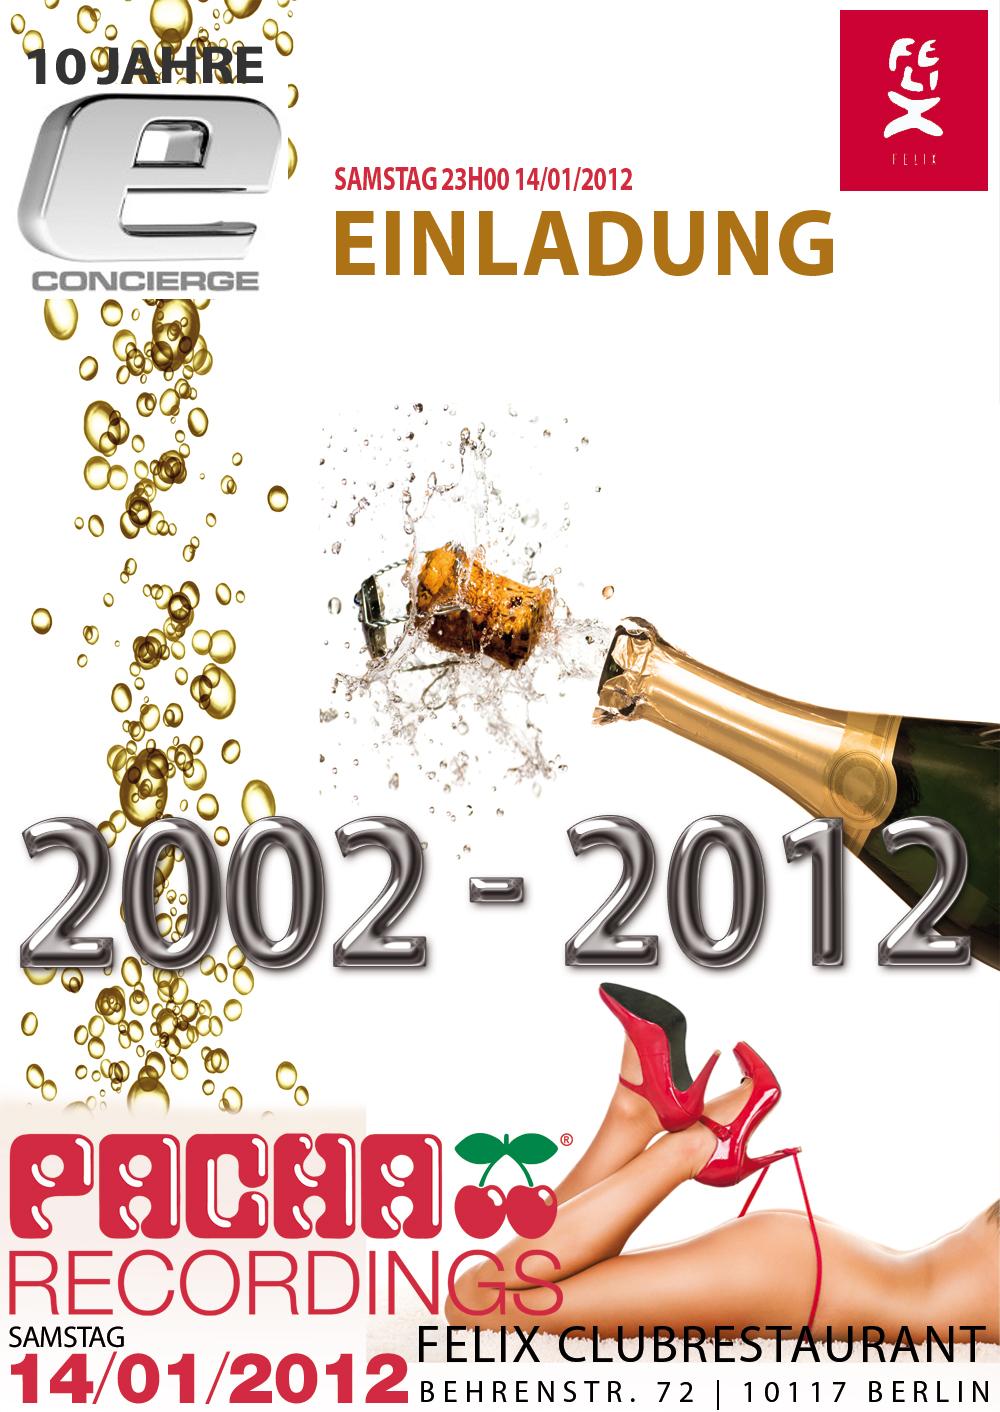 10-jährigen Jubiläum econcierge - Premium Felix Club Restaurant Berlin - Adlon Kempinski Hotel - Pacha Ibiza Party